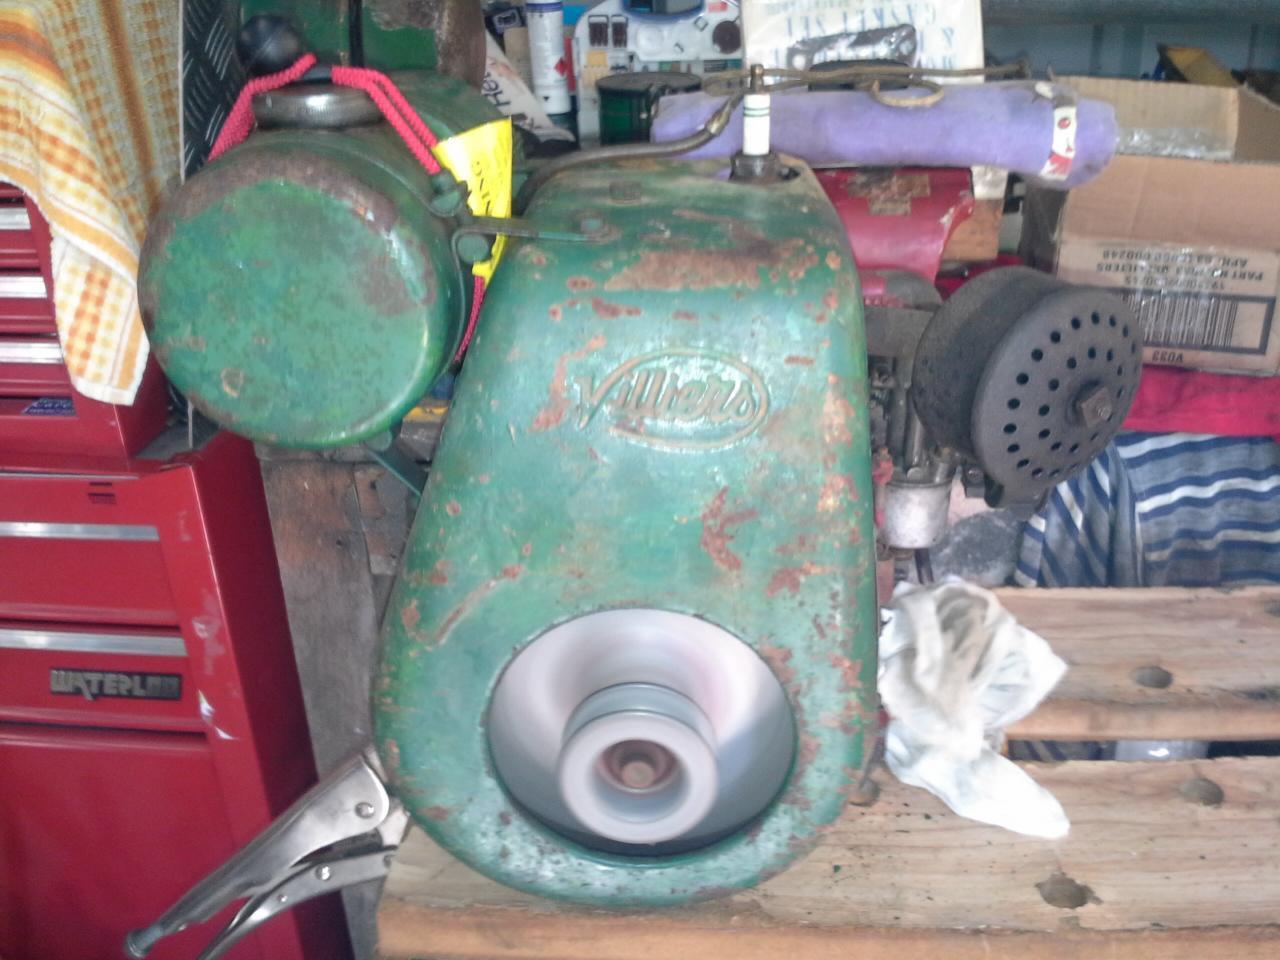 Villiers Mk10 Stationary Engine - OutdoorKing Repair Forum